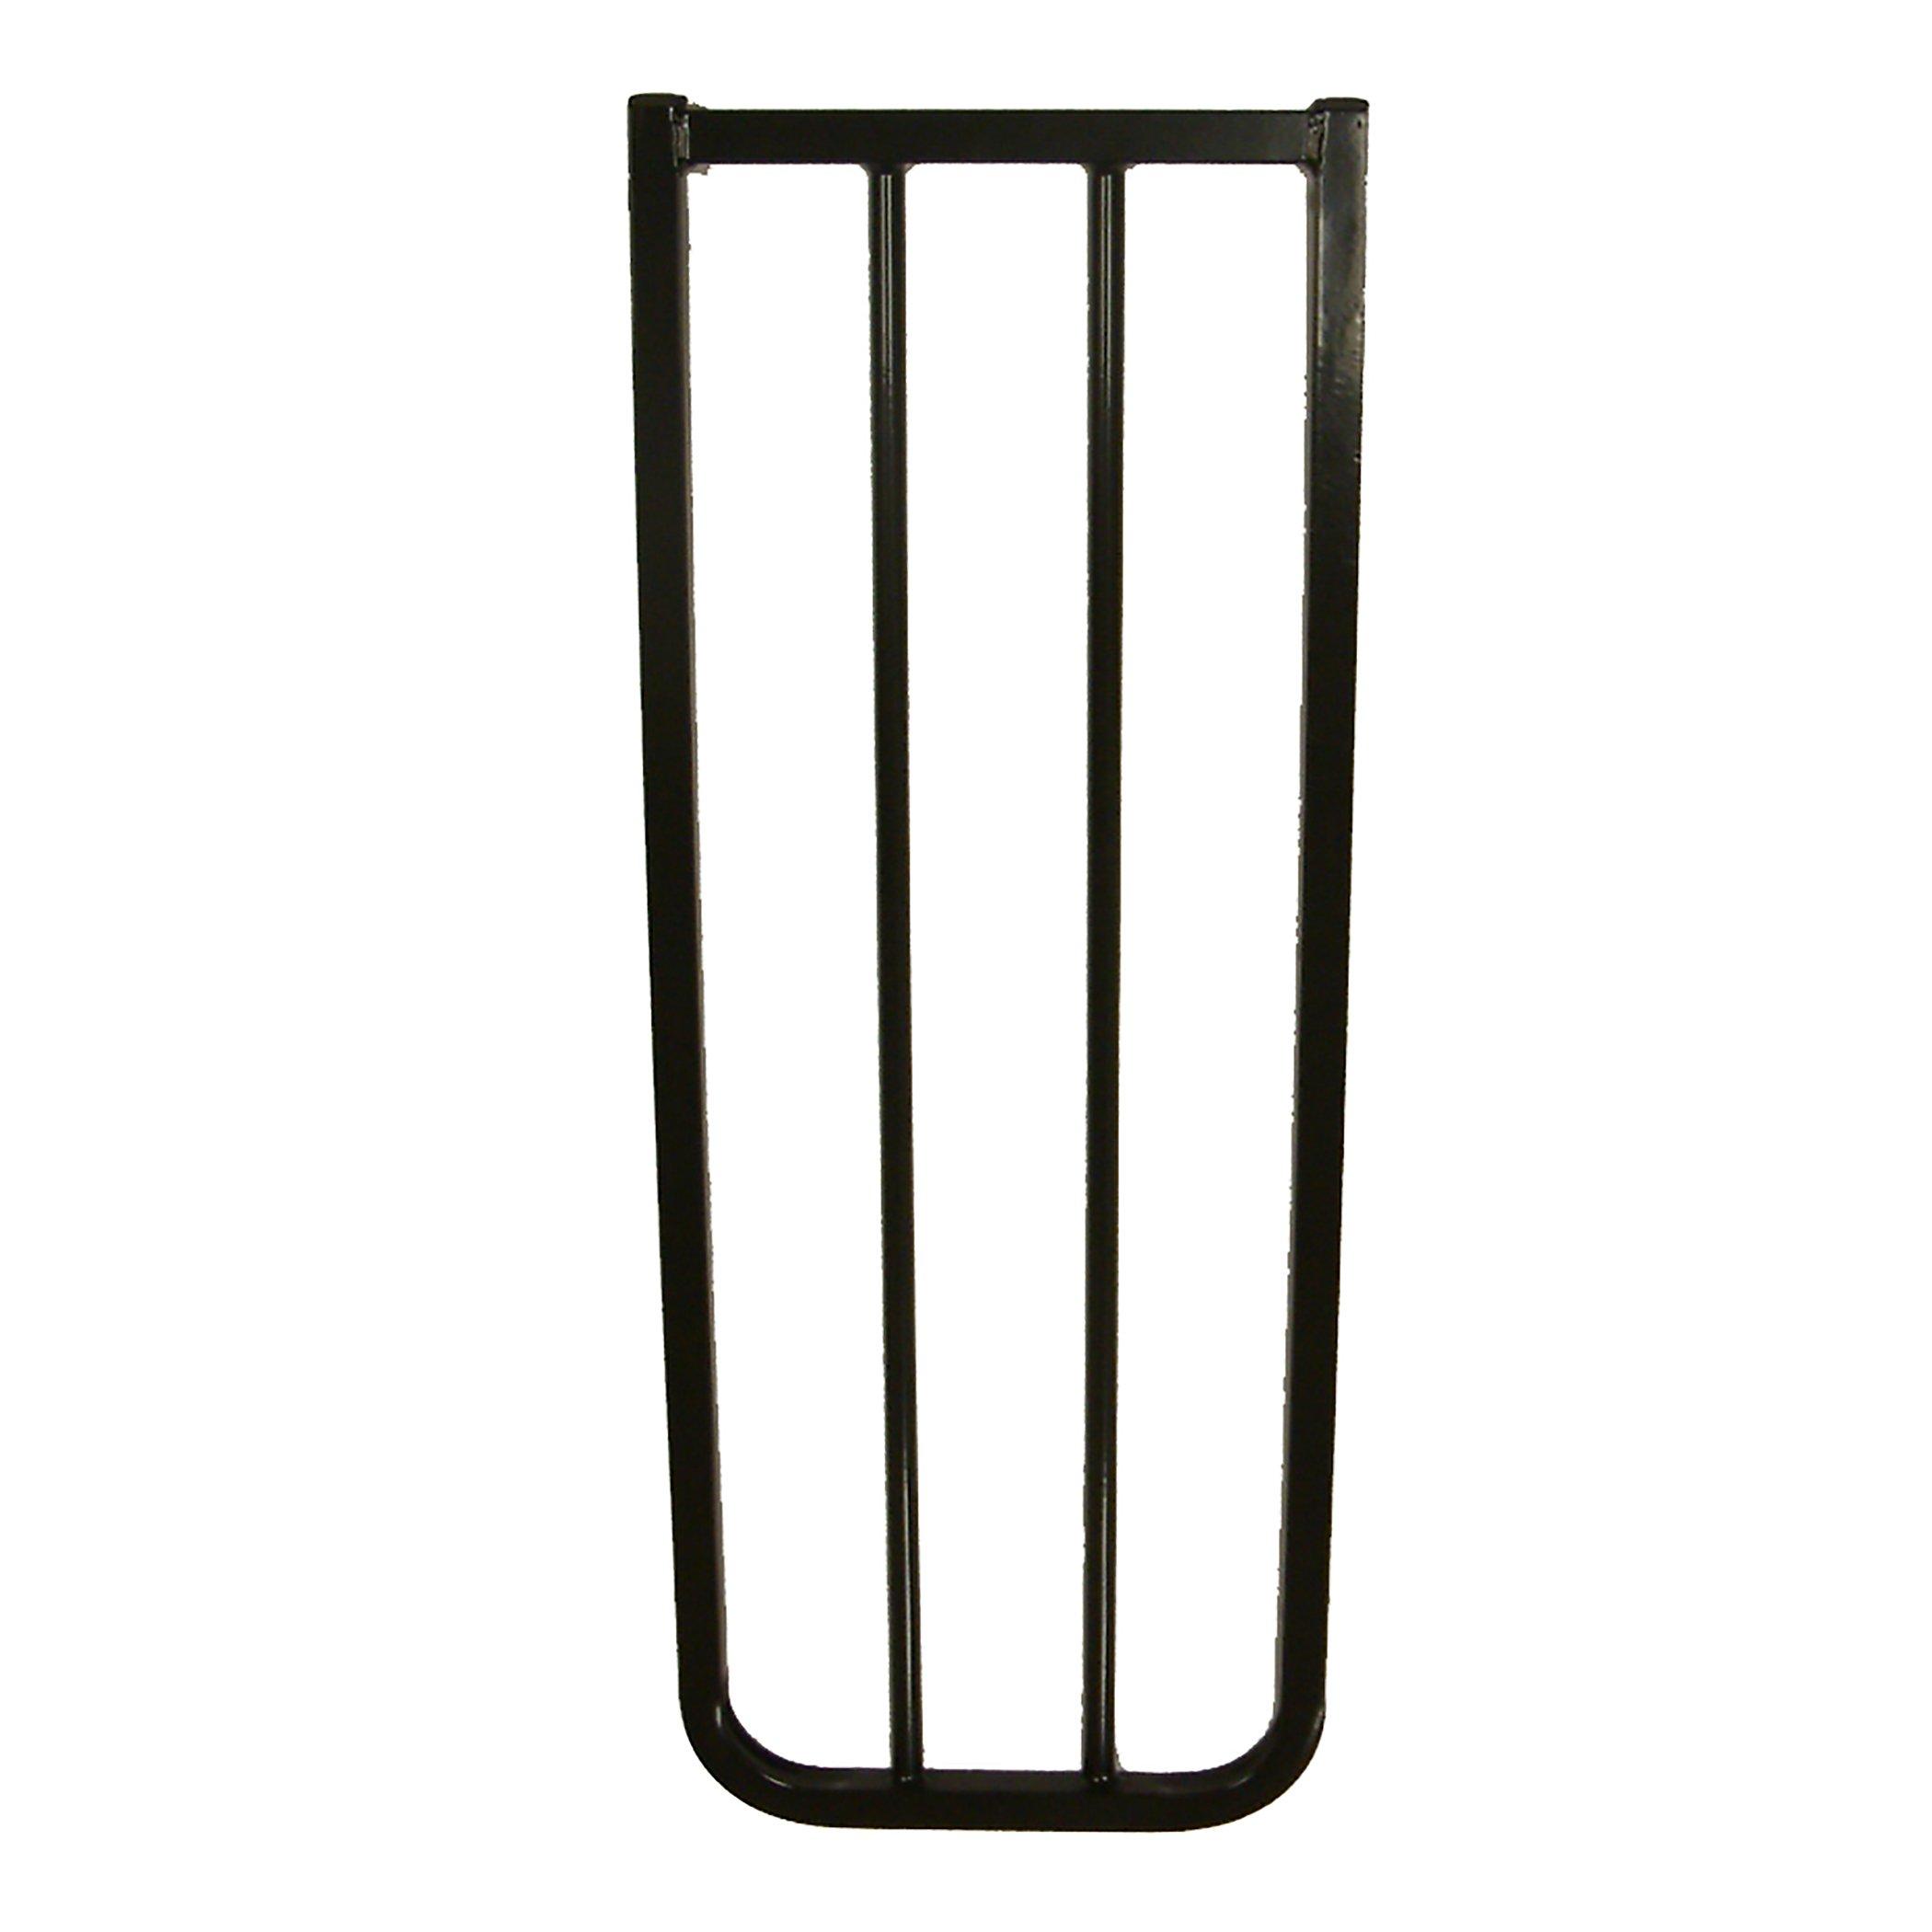 Cardinal Pet Gates 10.5-Inch Extension, Black by Cardinal Gates (Image #1)